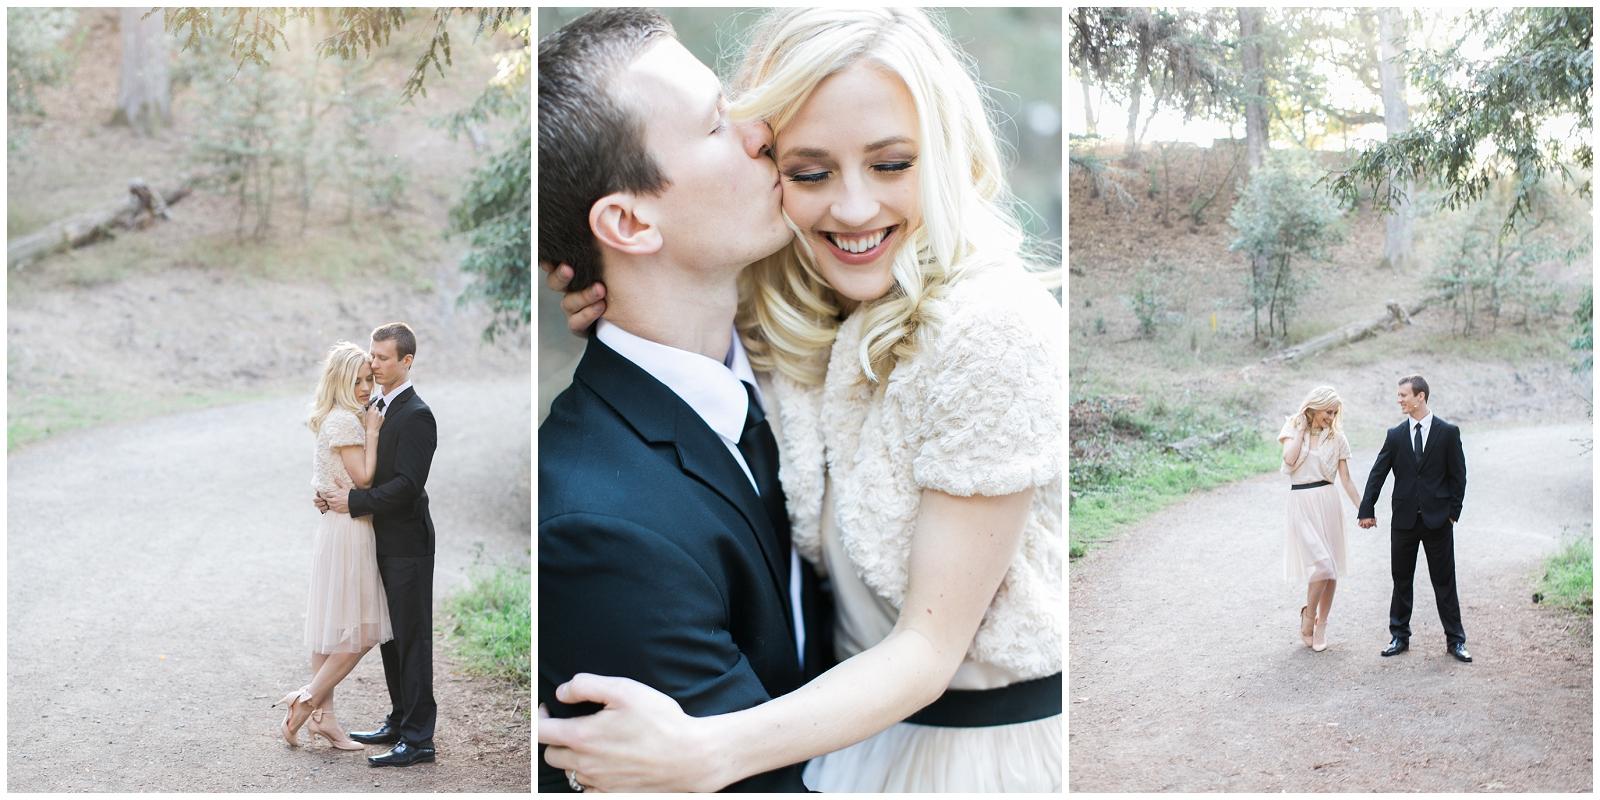 San-Francisco-Bay-Area-Wedding-Photography-Engagement-Redwoods-9.jpg